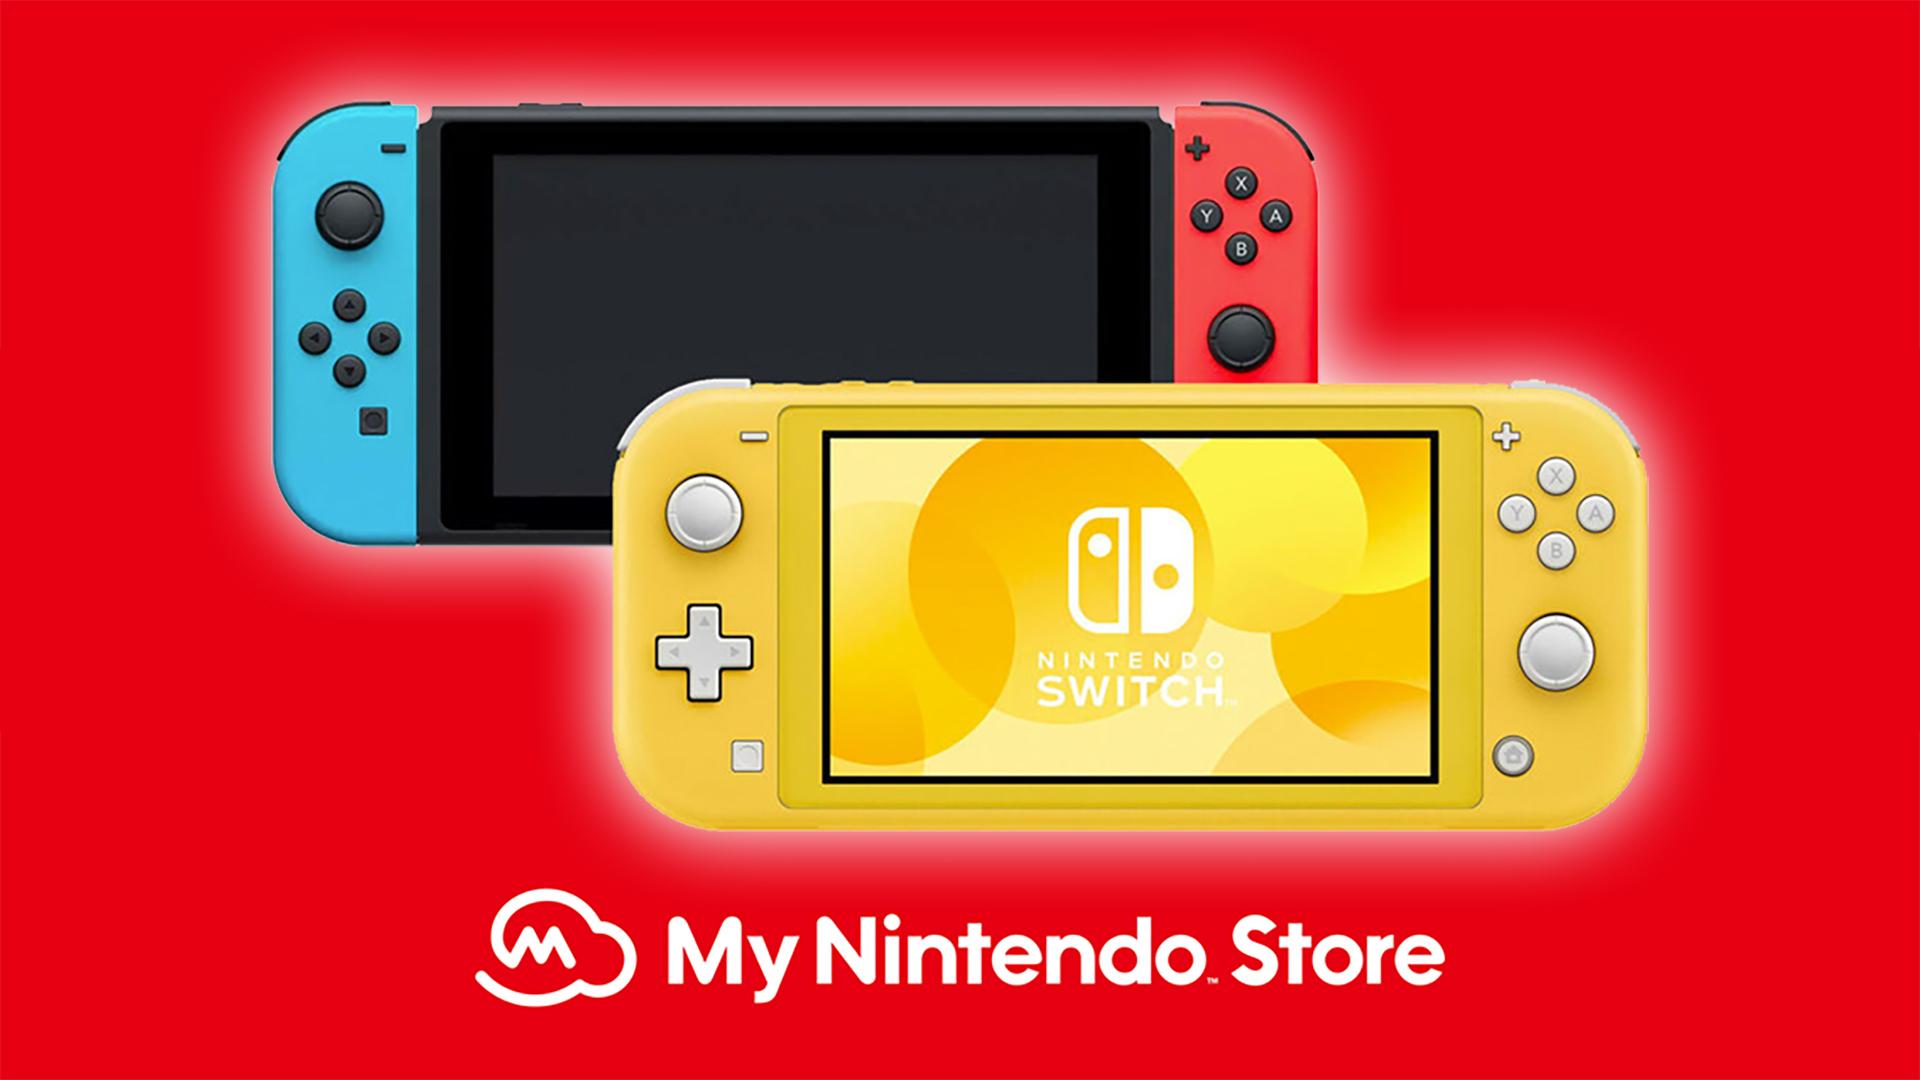 SwitchLite-MyNintendoStore-nintendon